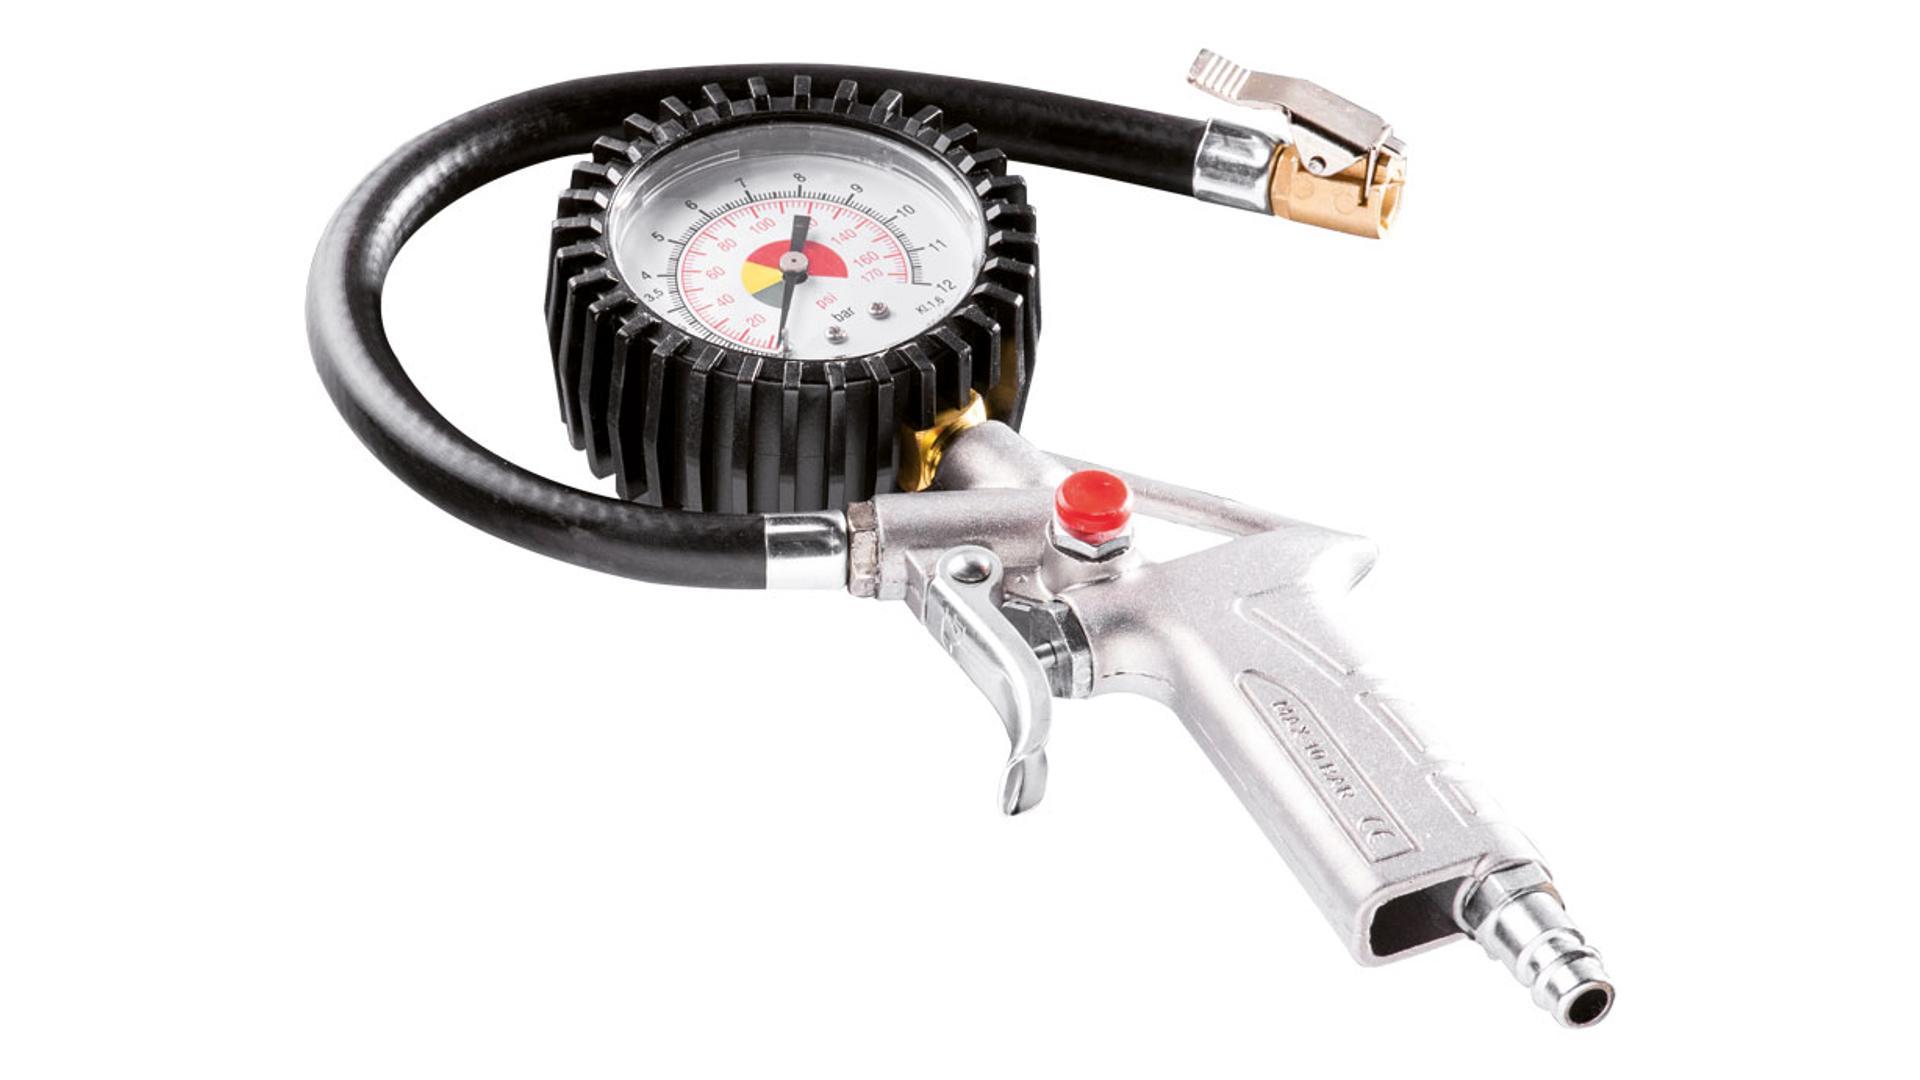 NEO Pumpovacia pištoľ 63mm